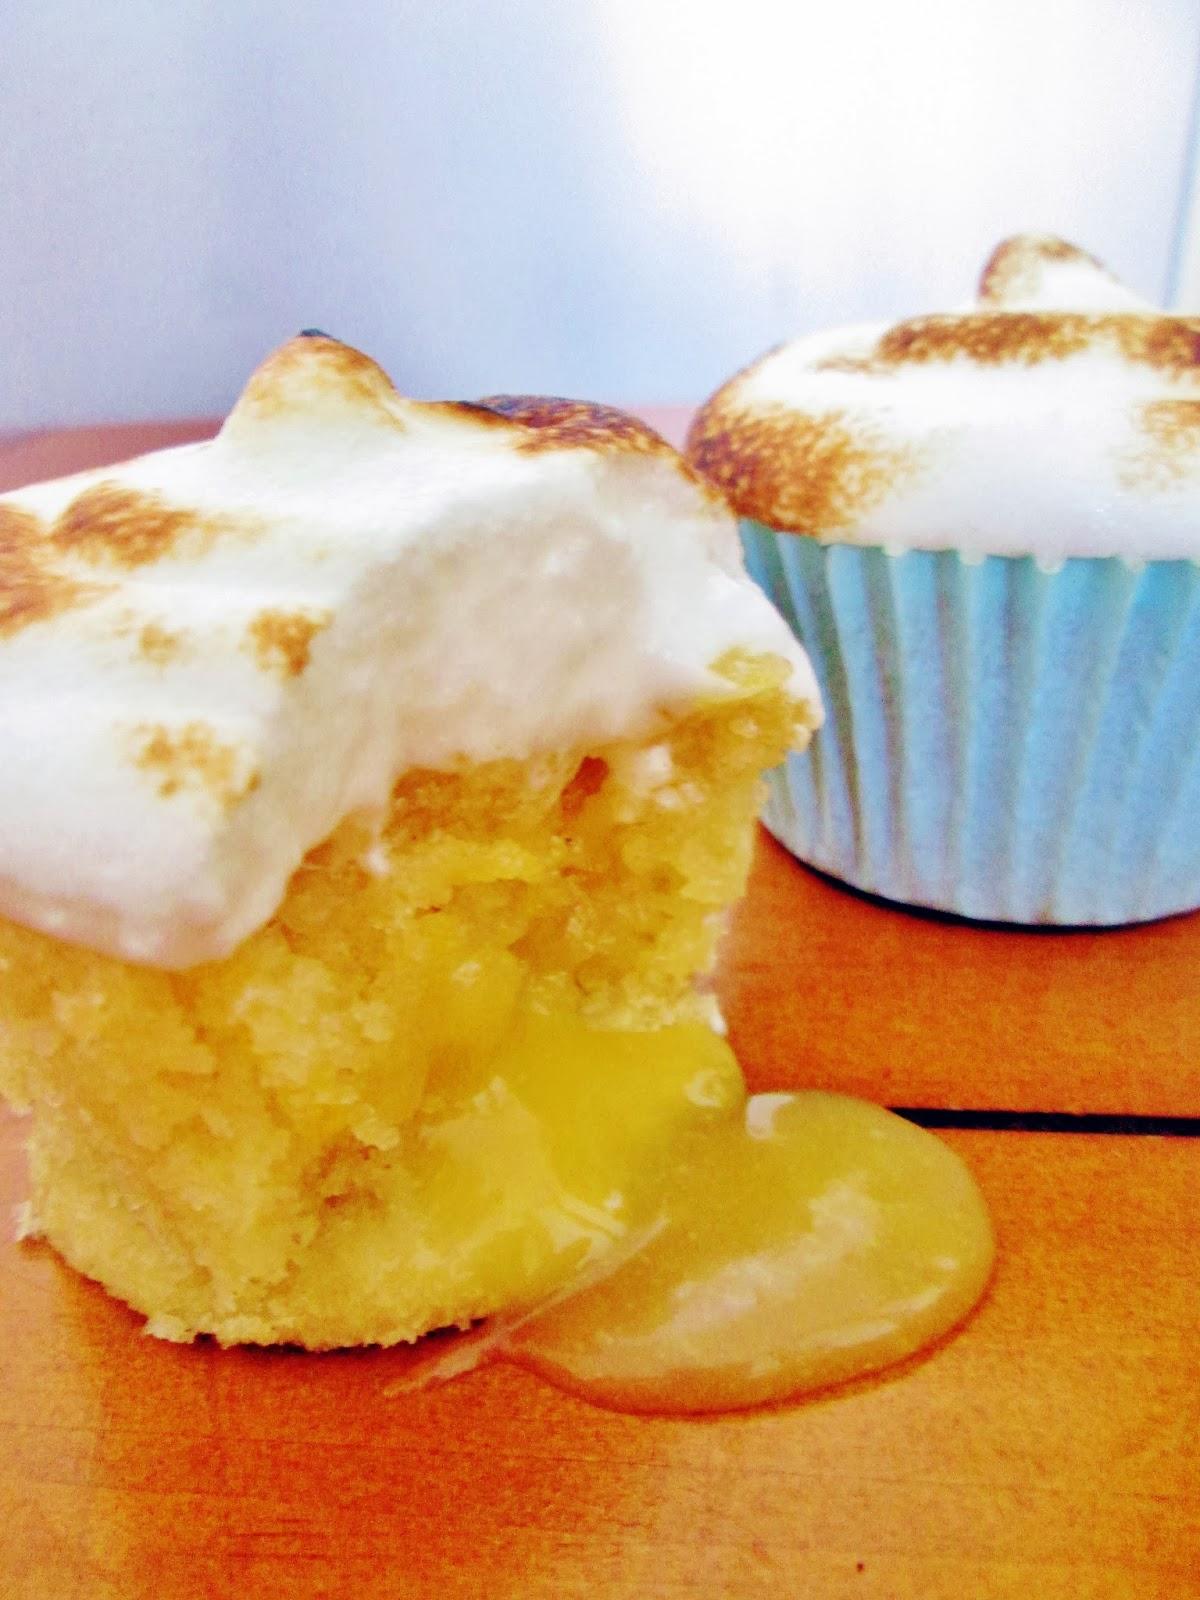 http://themessykitchenuk.blogspot.co.uk/2014/02/lemon-meringue-pie-cupcakes.html